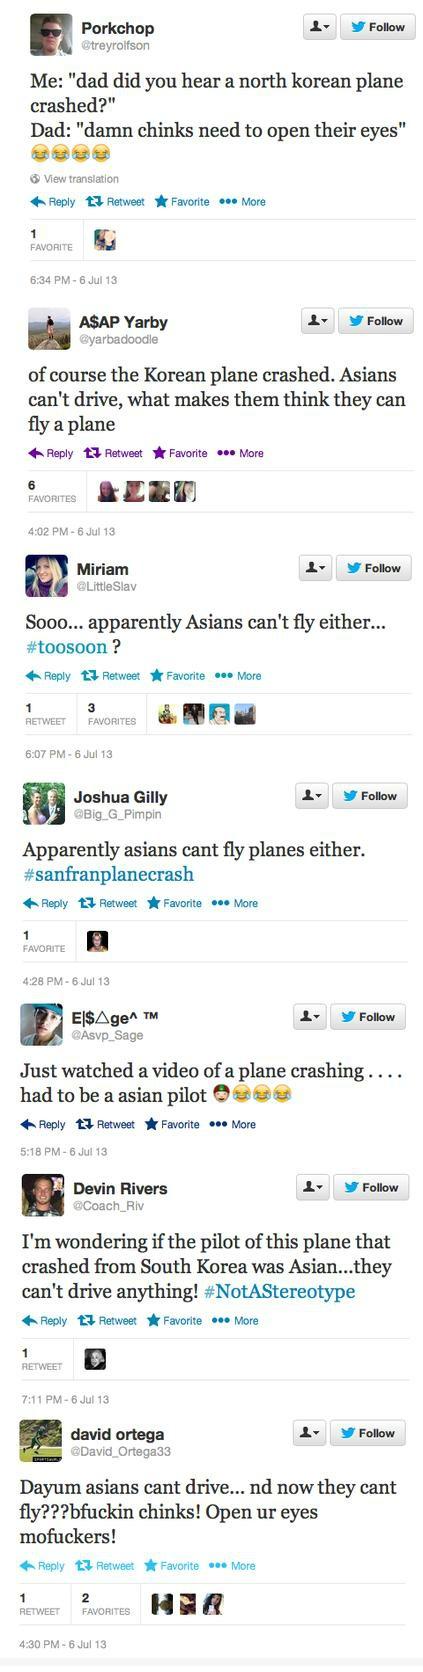 Asiana Plane Crash SFO racist tweets trey rolfson joshua gilley devin rivers david ortega